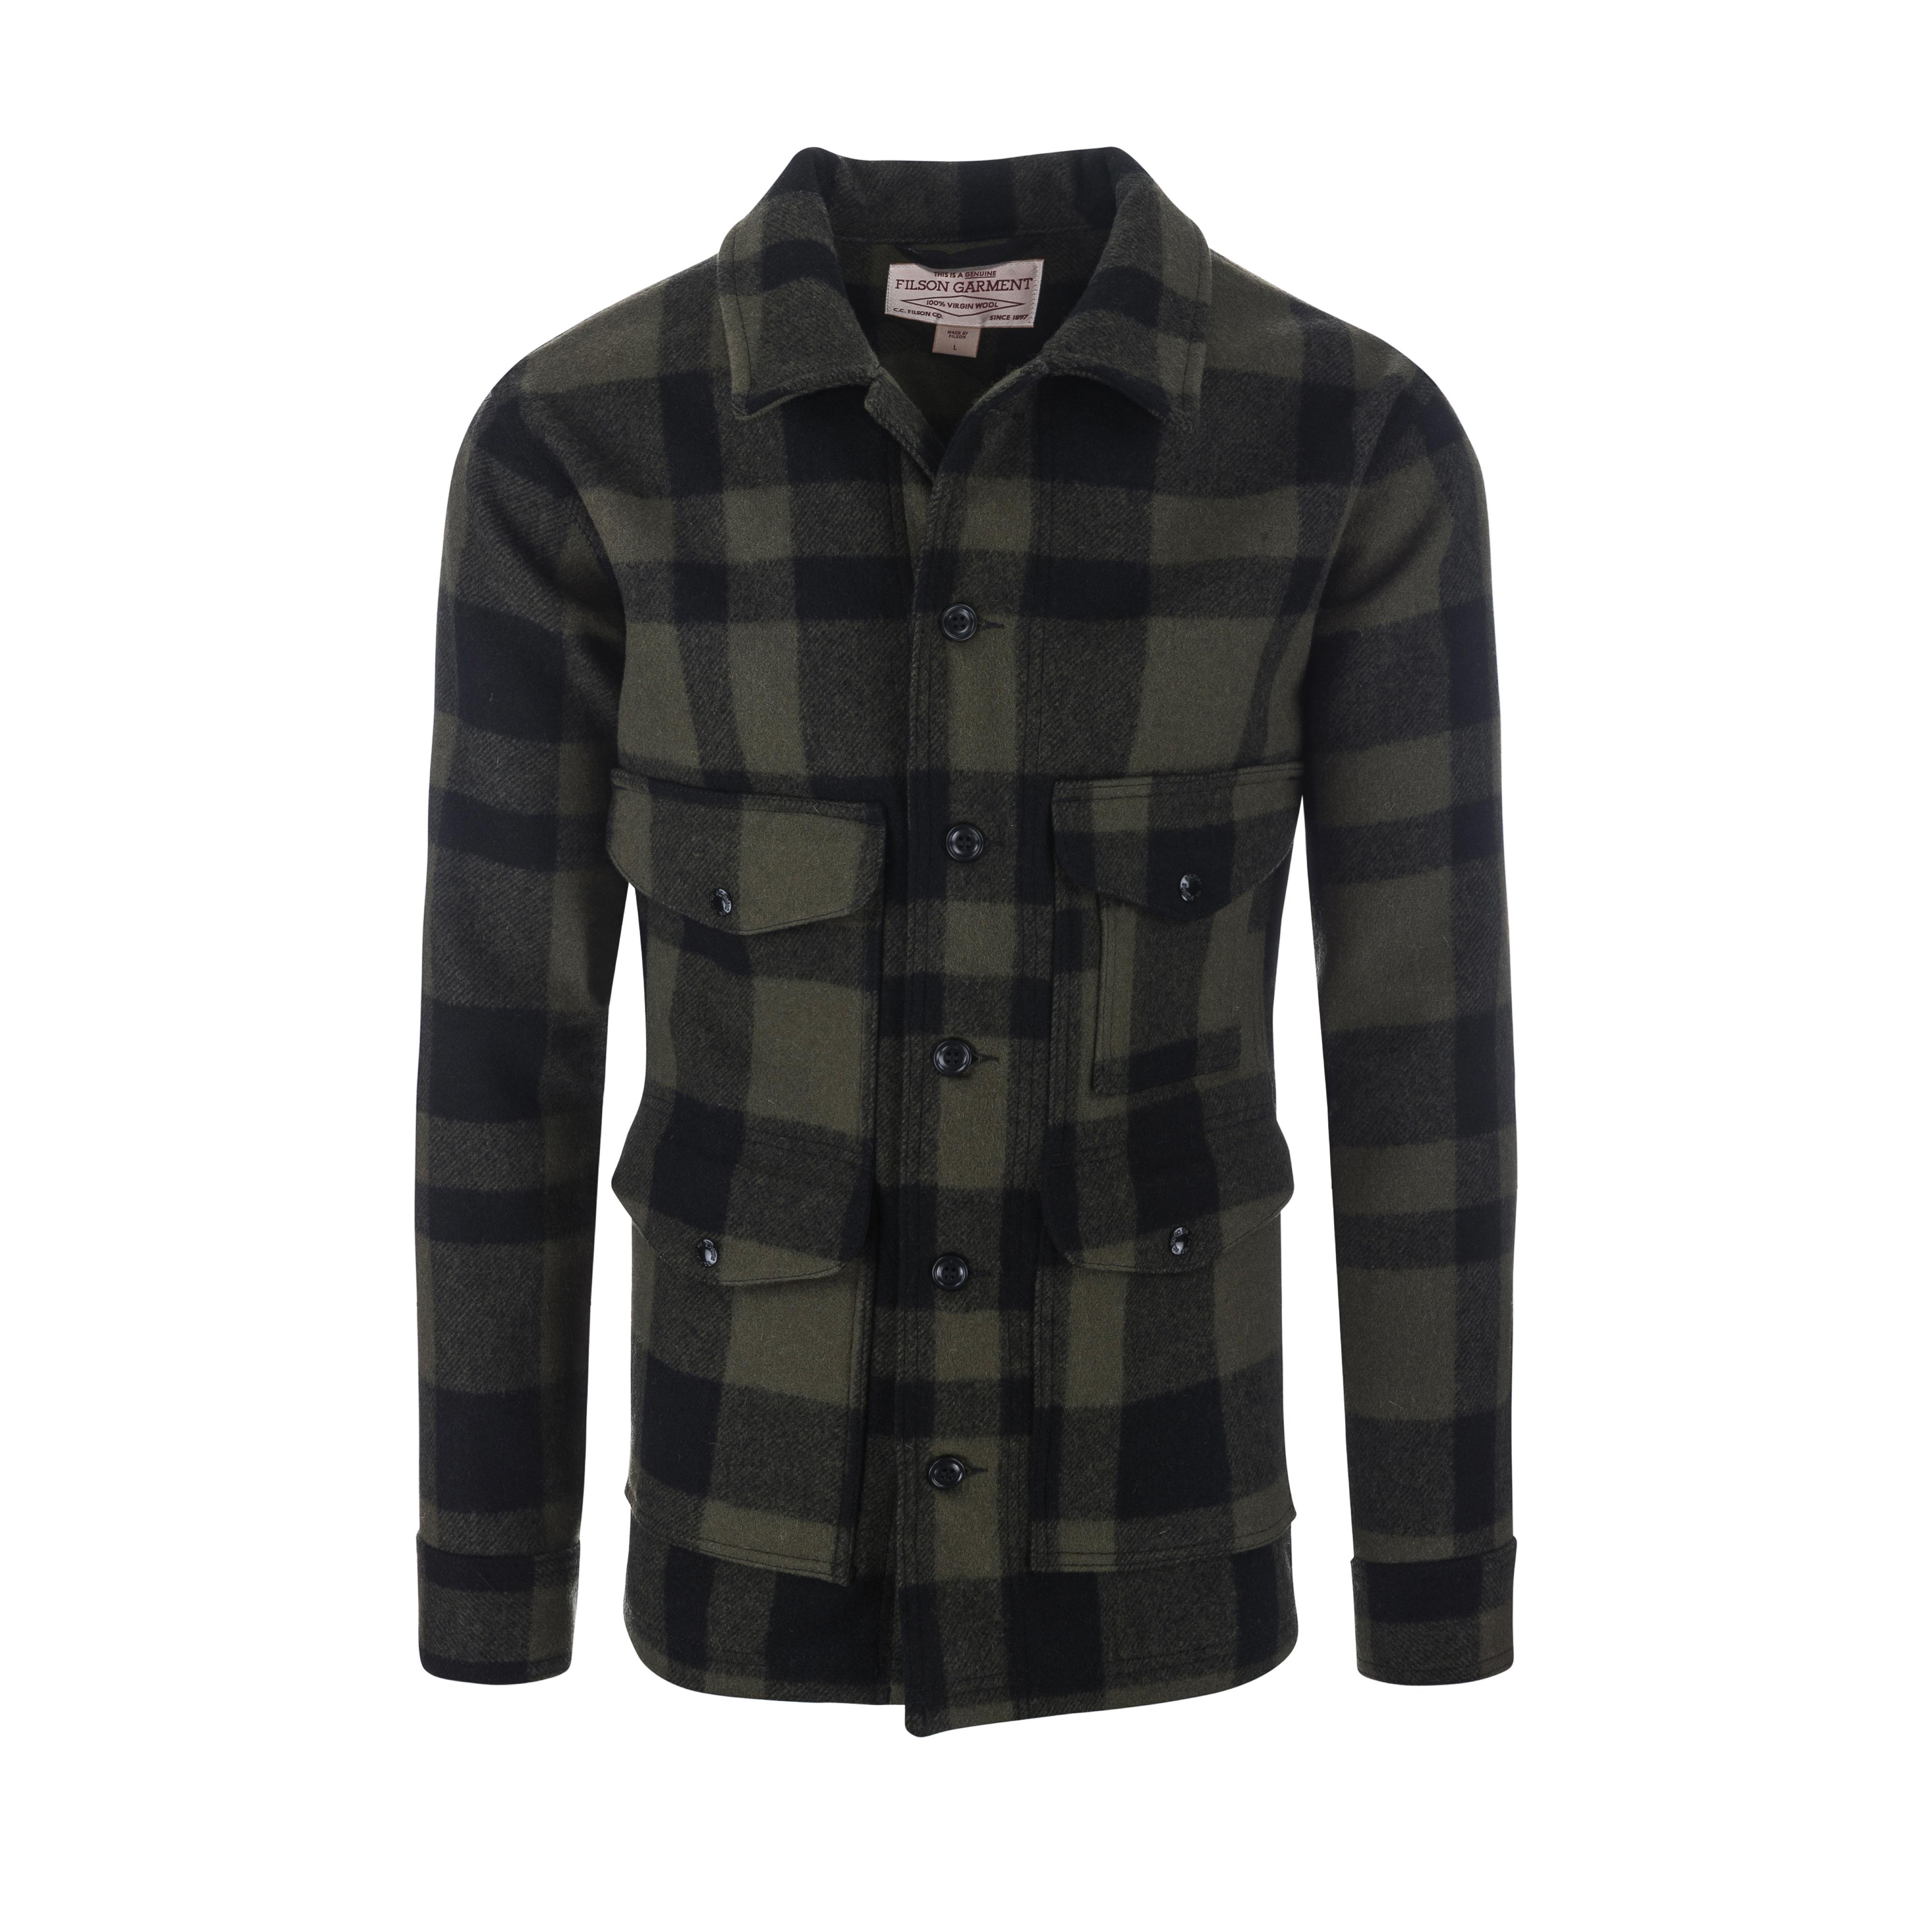 Wool Mackinaw Cruiser Jacket Otter Green/Black